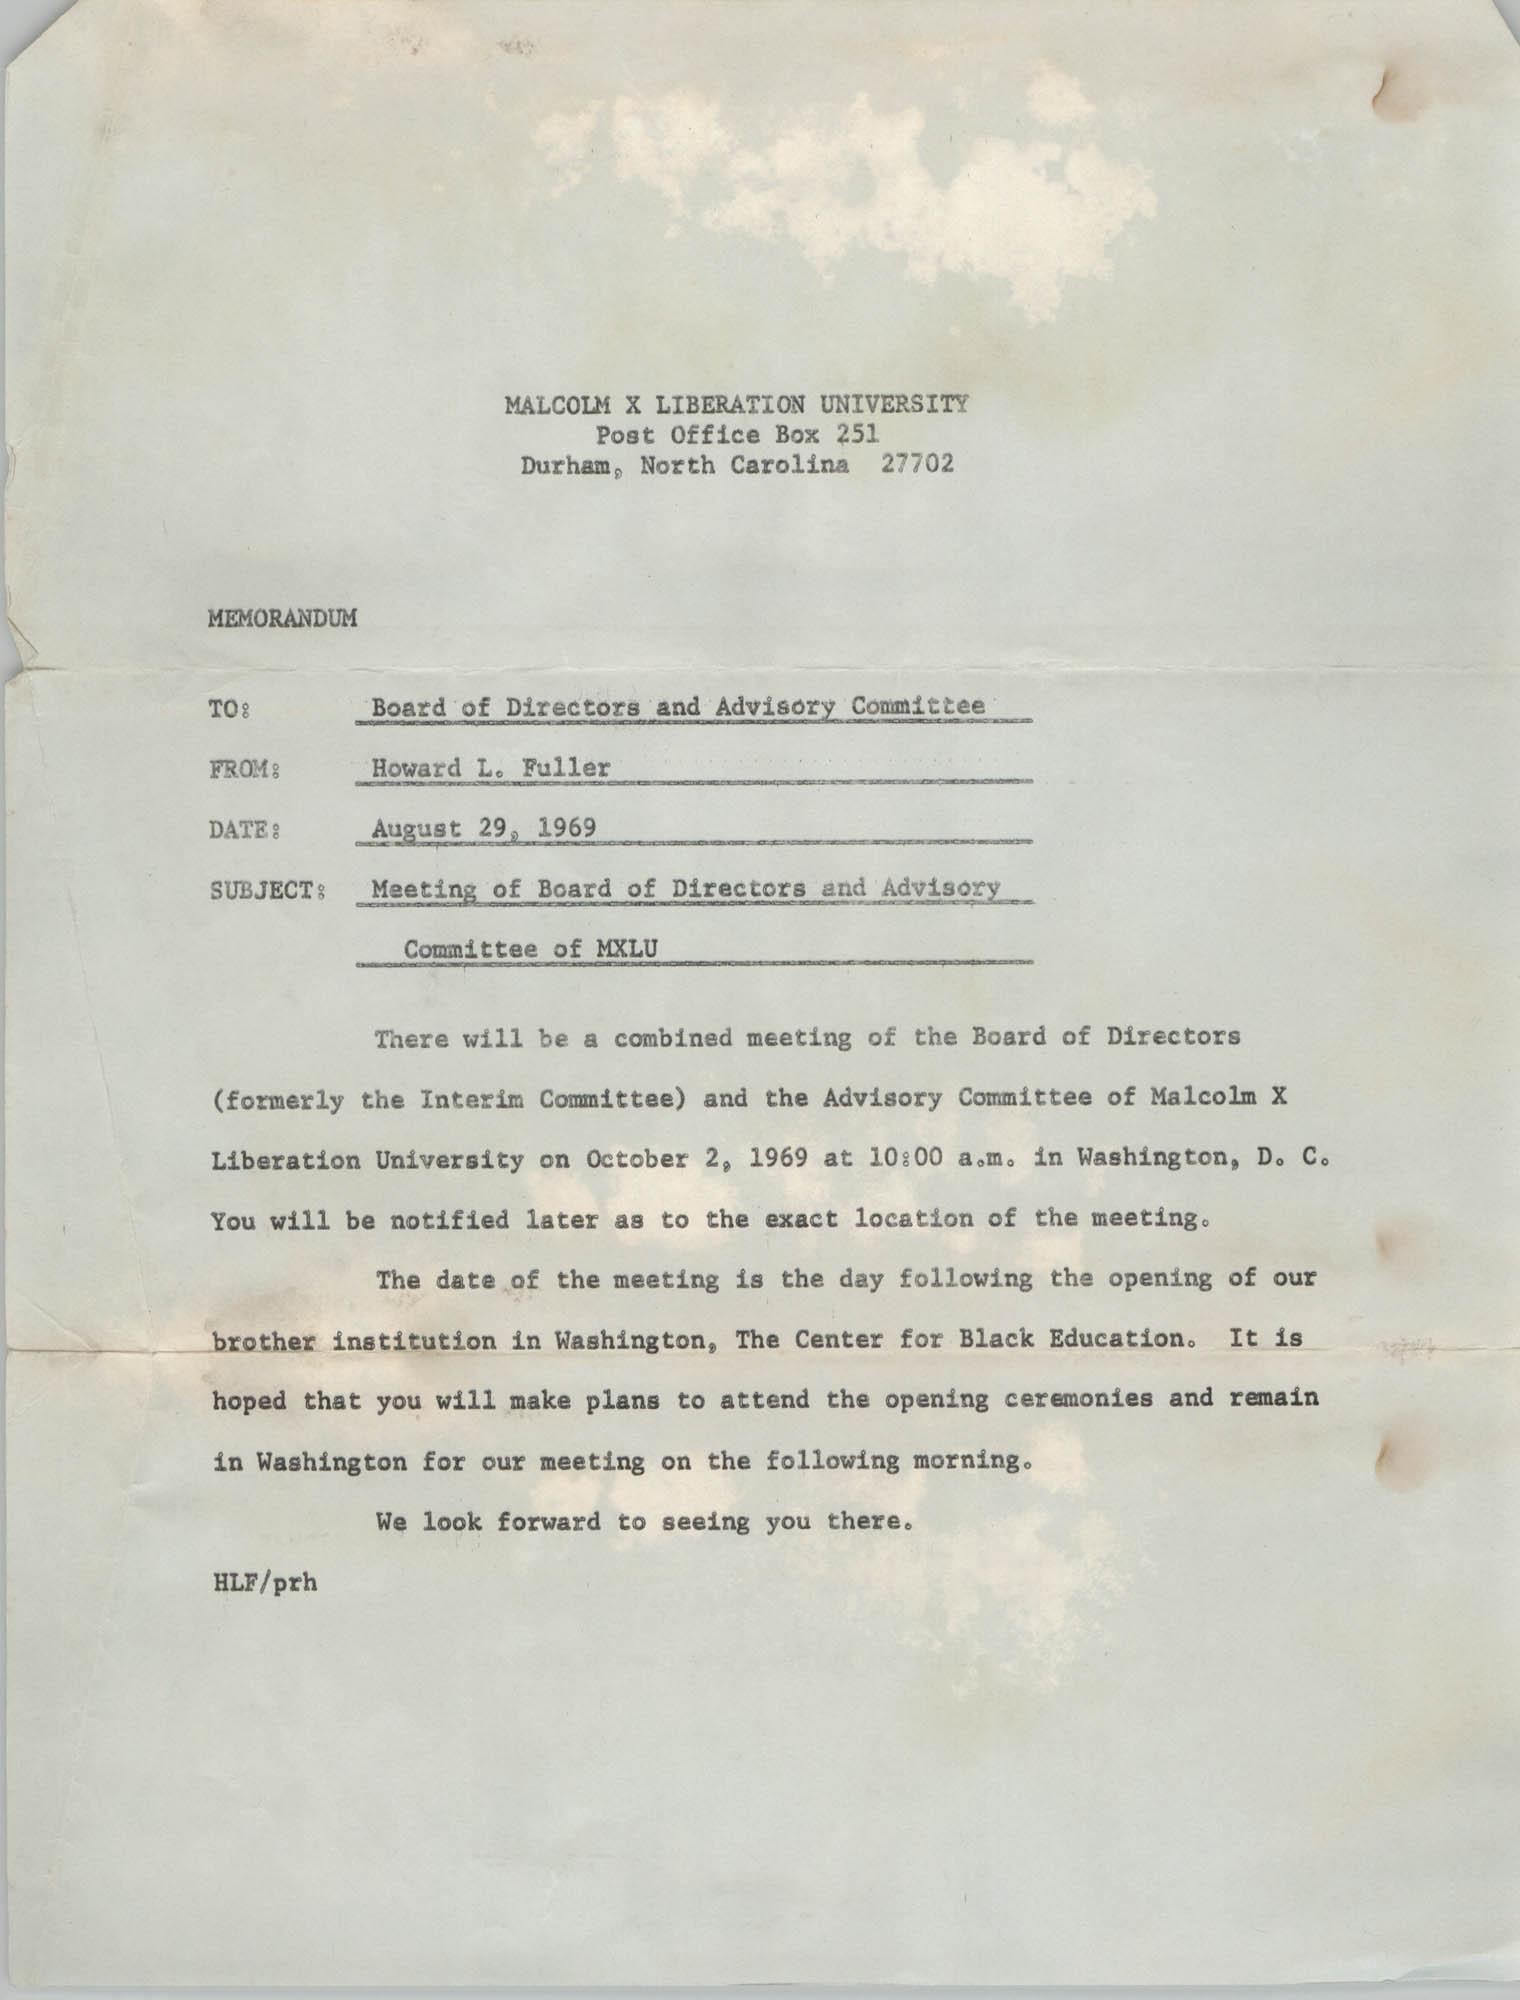 Malcolm X Liberation University Memorandum, August 29, 1969